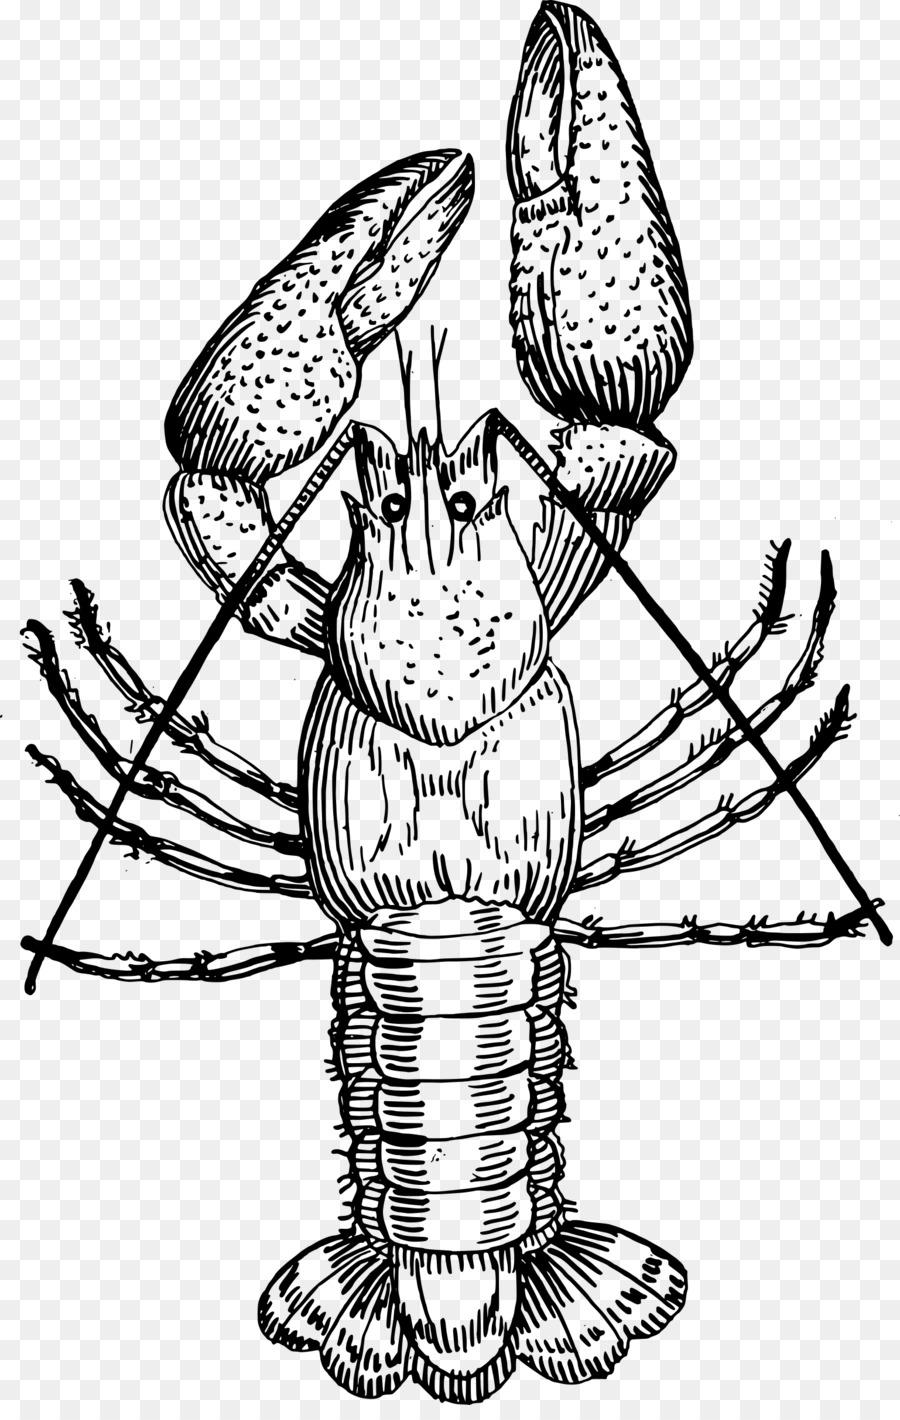 Lobster Air Tawar Gambar Louisiana Udang Gambar Png